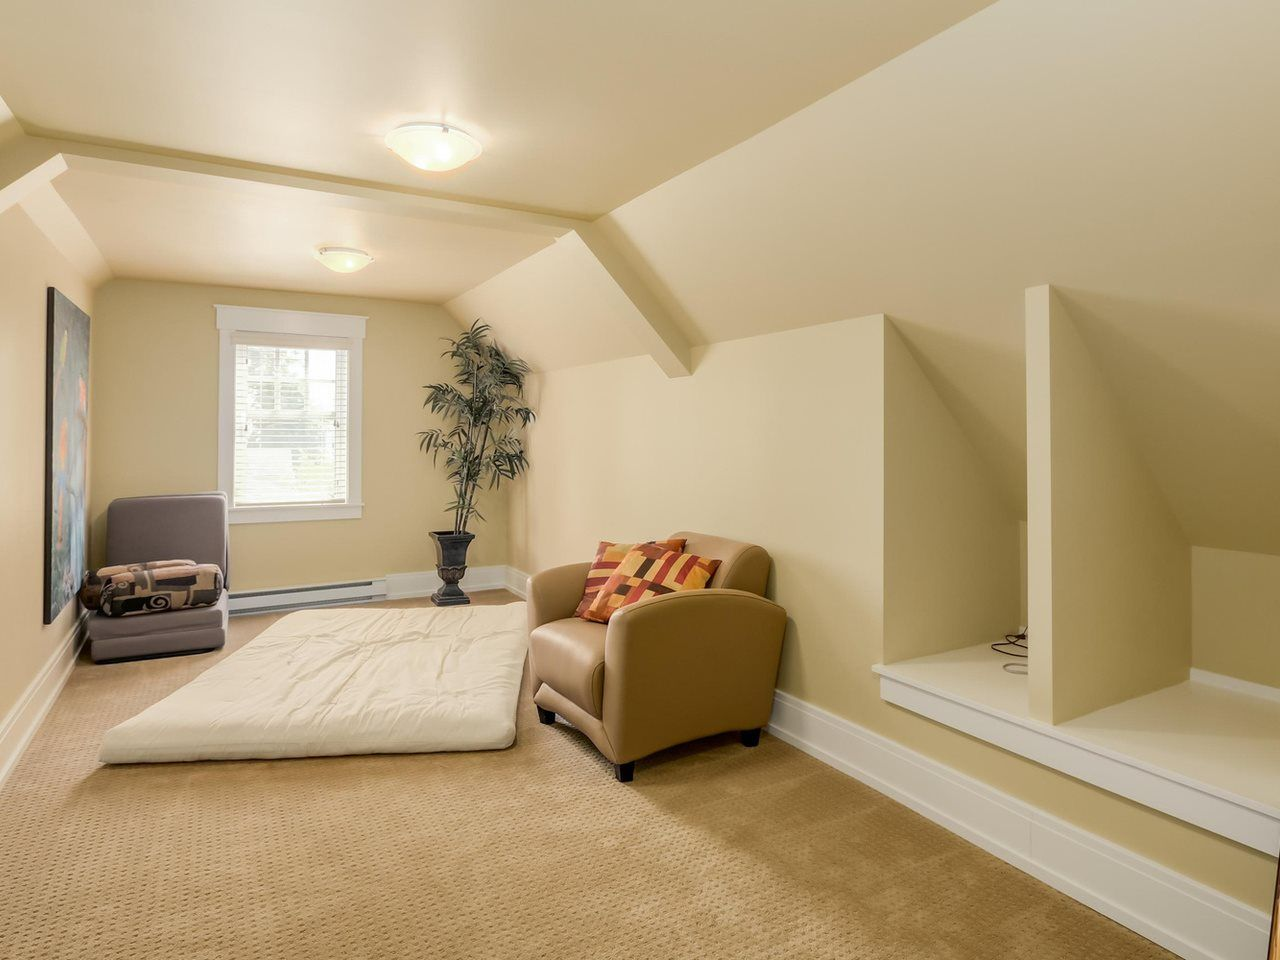 Photo 19: Photos: 13029 14 Avenue in Surrey: Crescent Bch Ocean Pk. House for sale (South Surrey White Rock)  : MLS®# R2070160